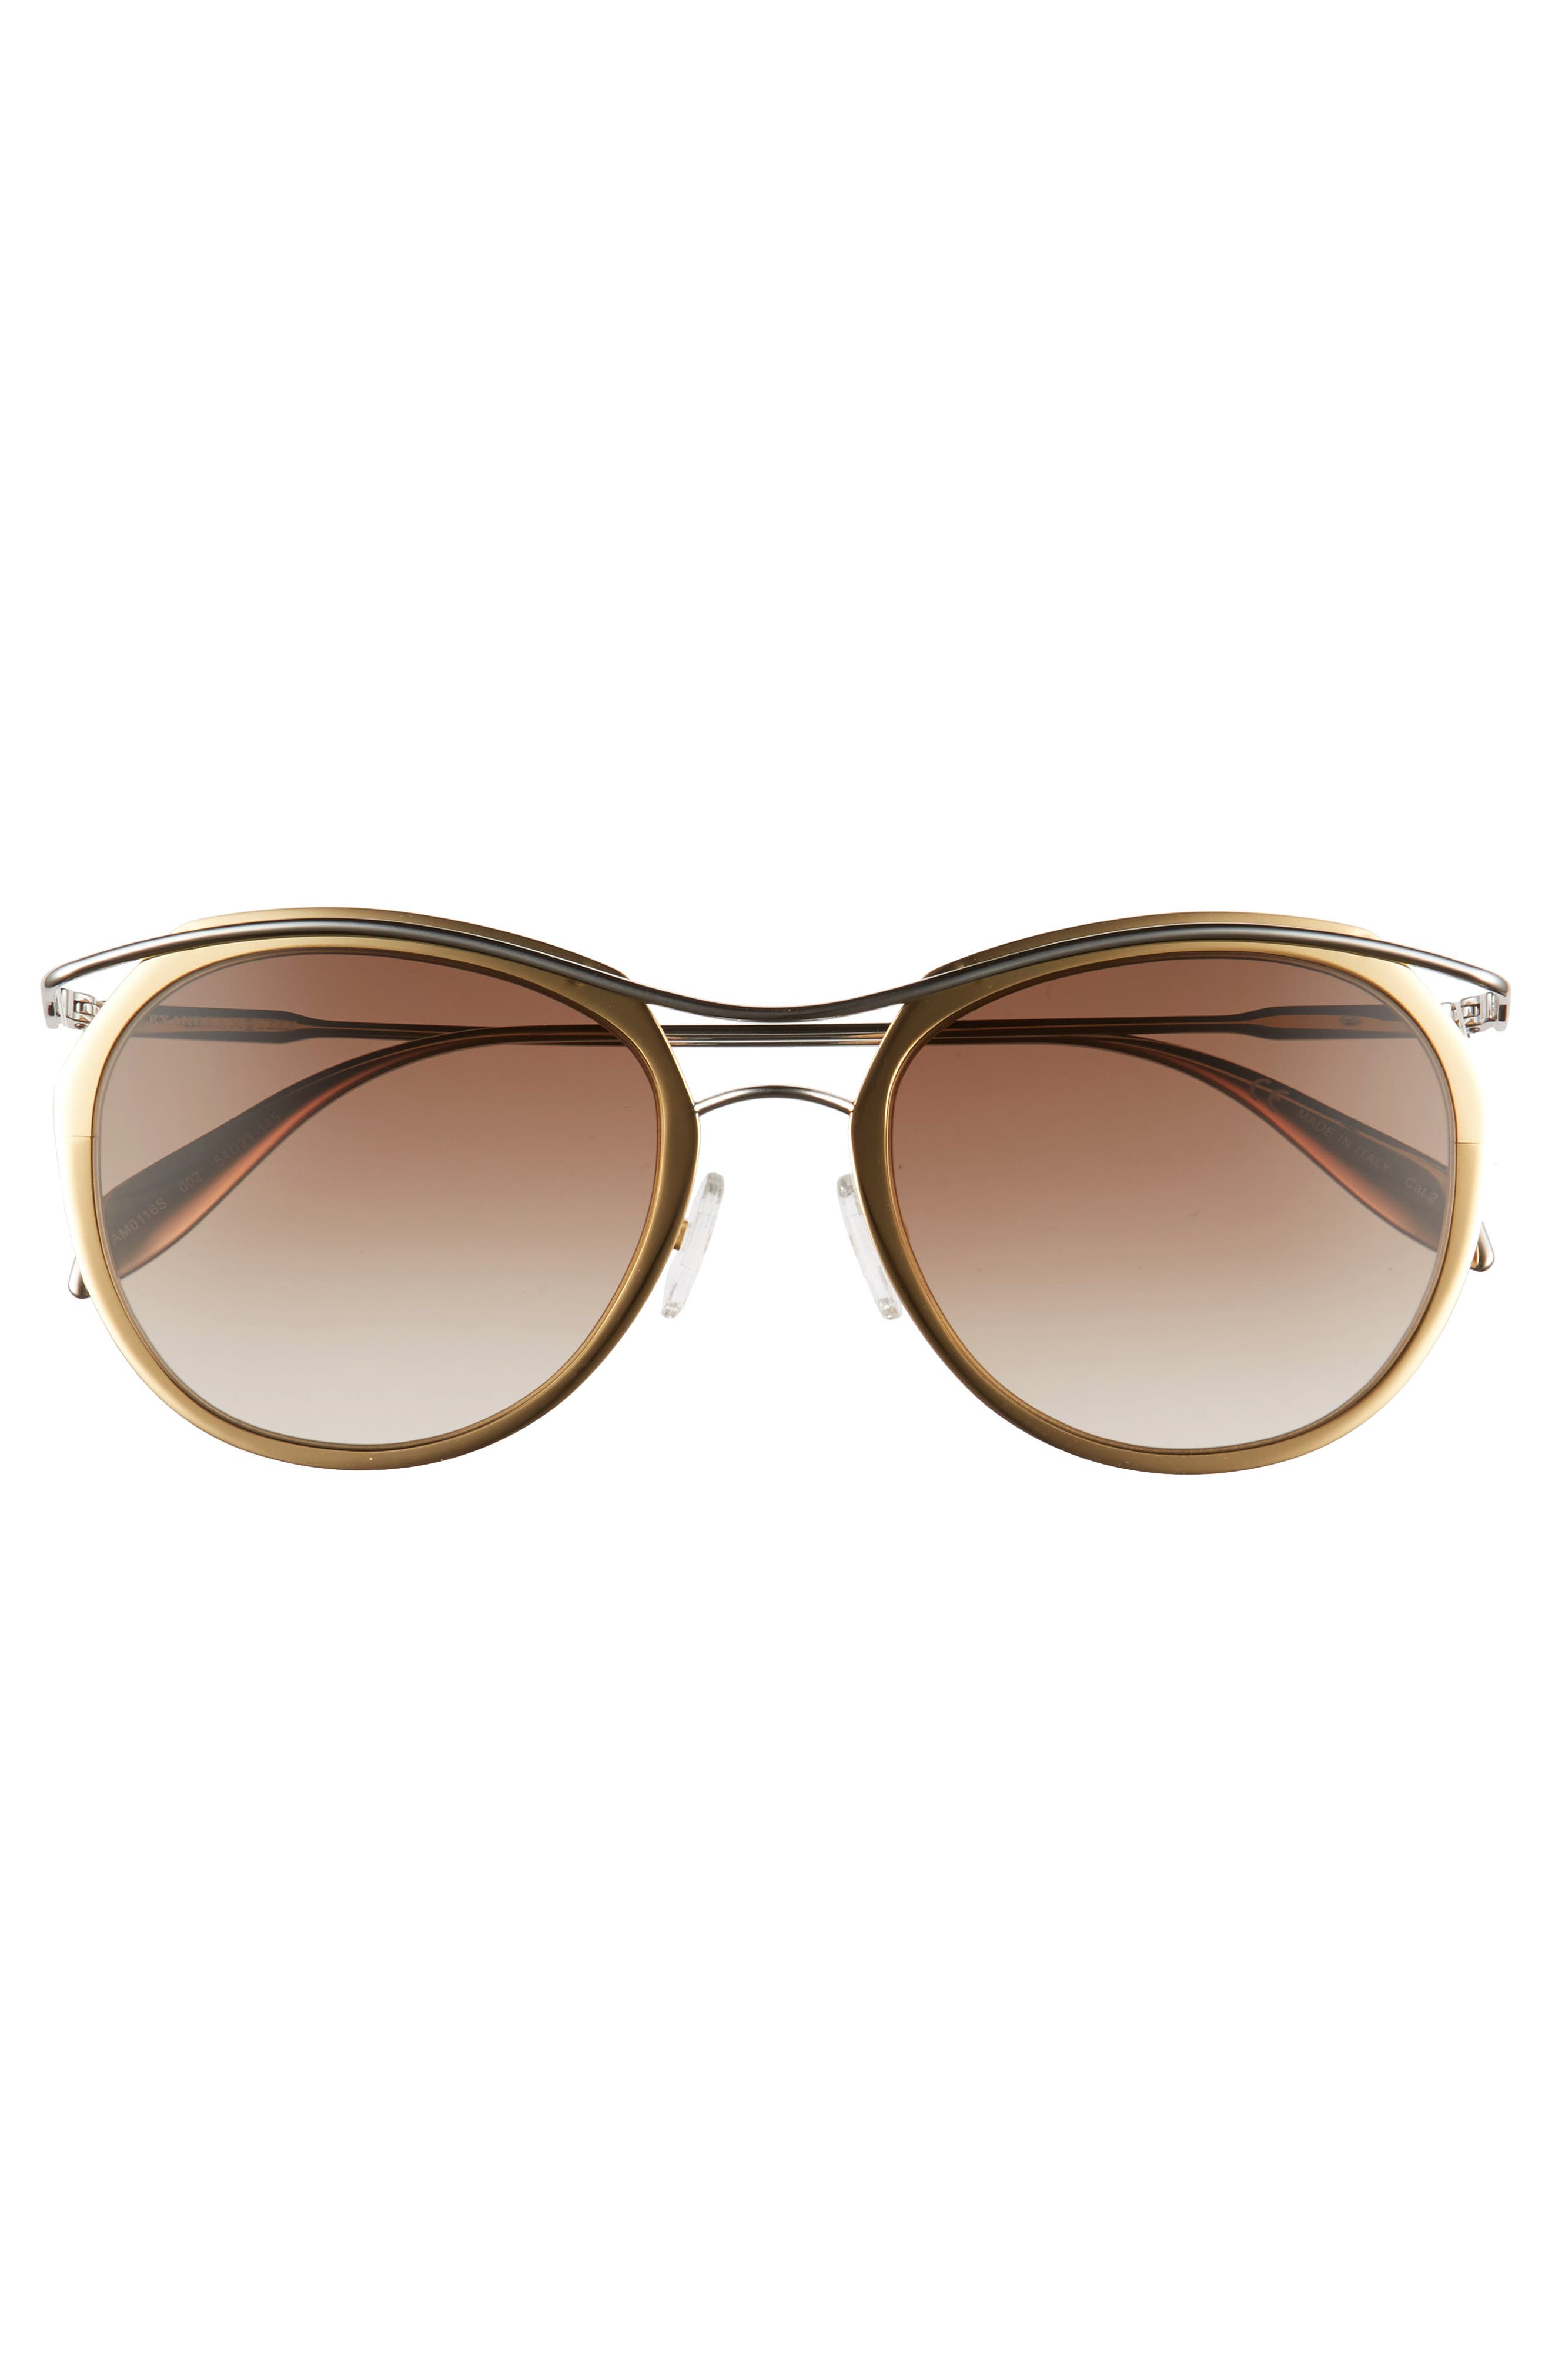 Alternate Image 3  - Alexander McQueen 54mm Gradient Round Sunglasses